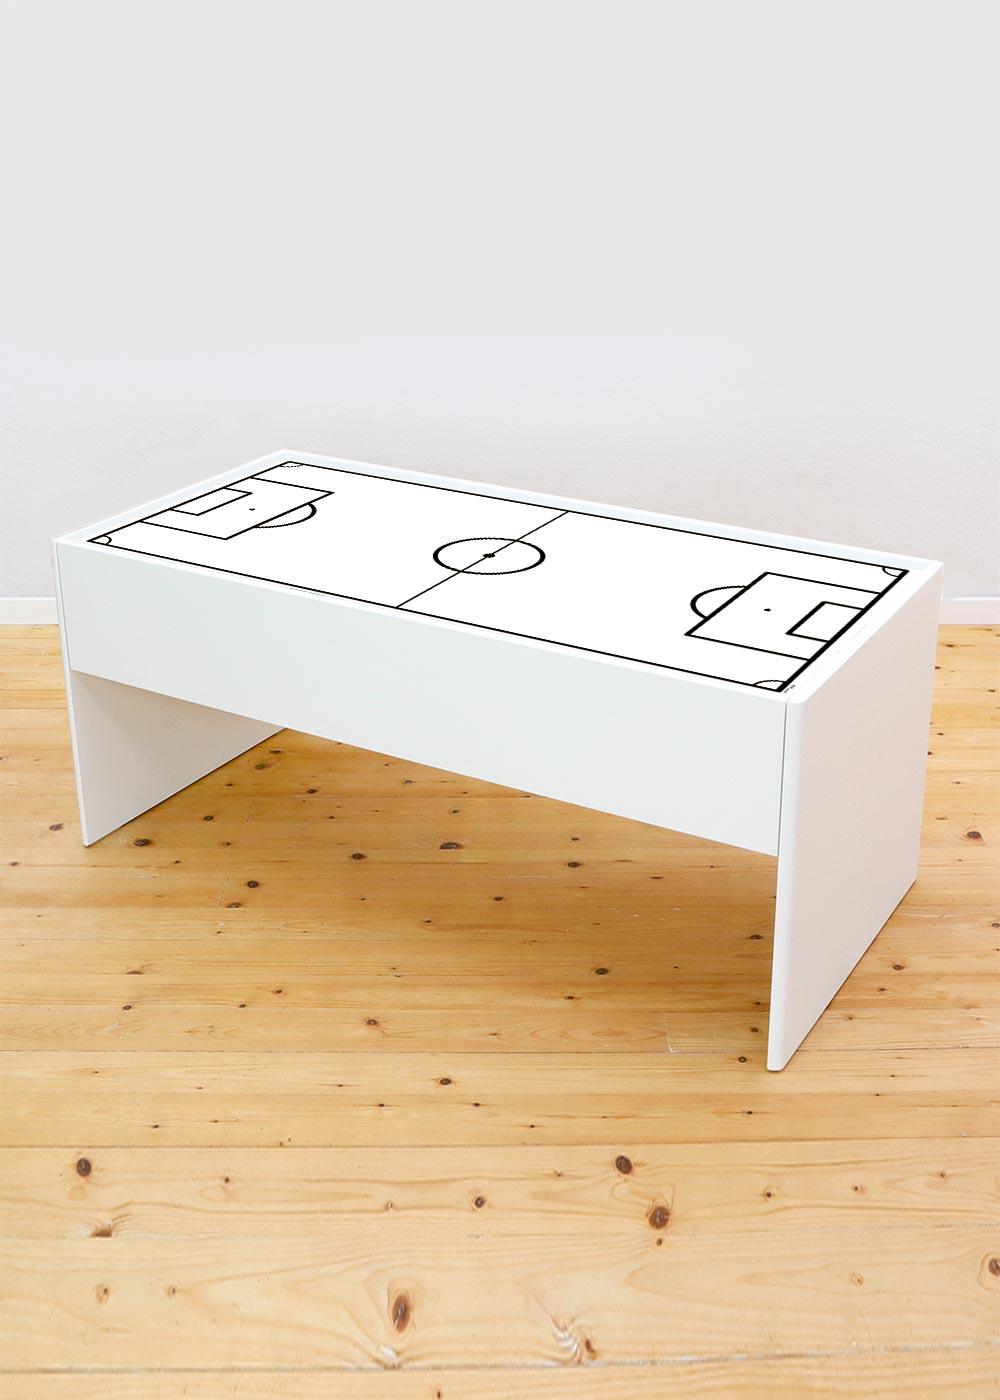 Ikea Dundra Spieltisch Fussballfeld weiss Komplettansicht